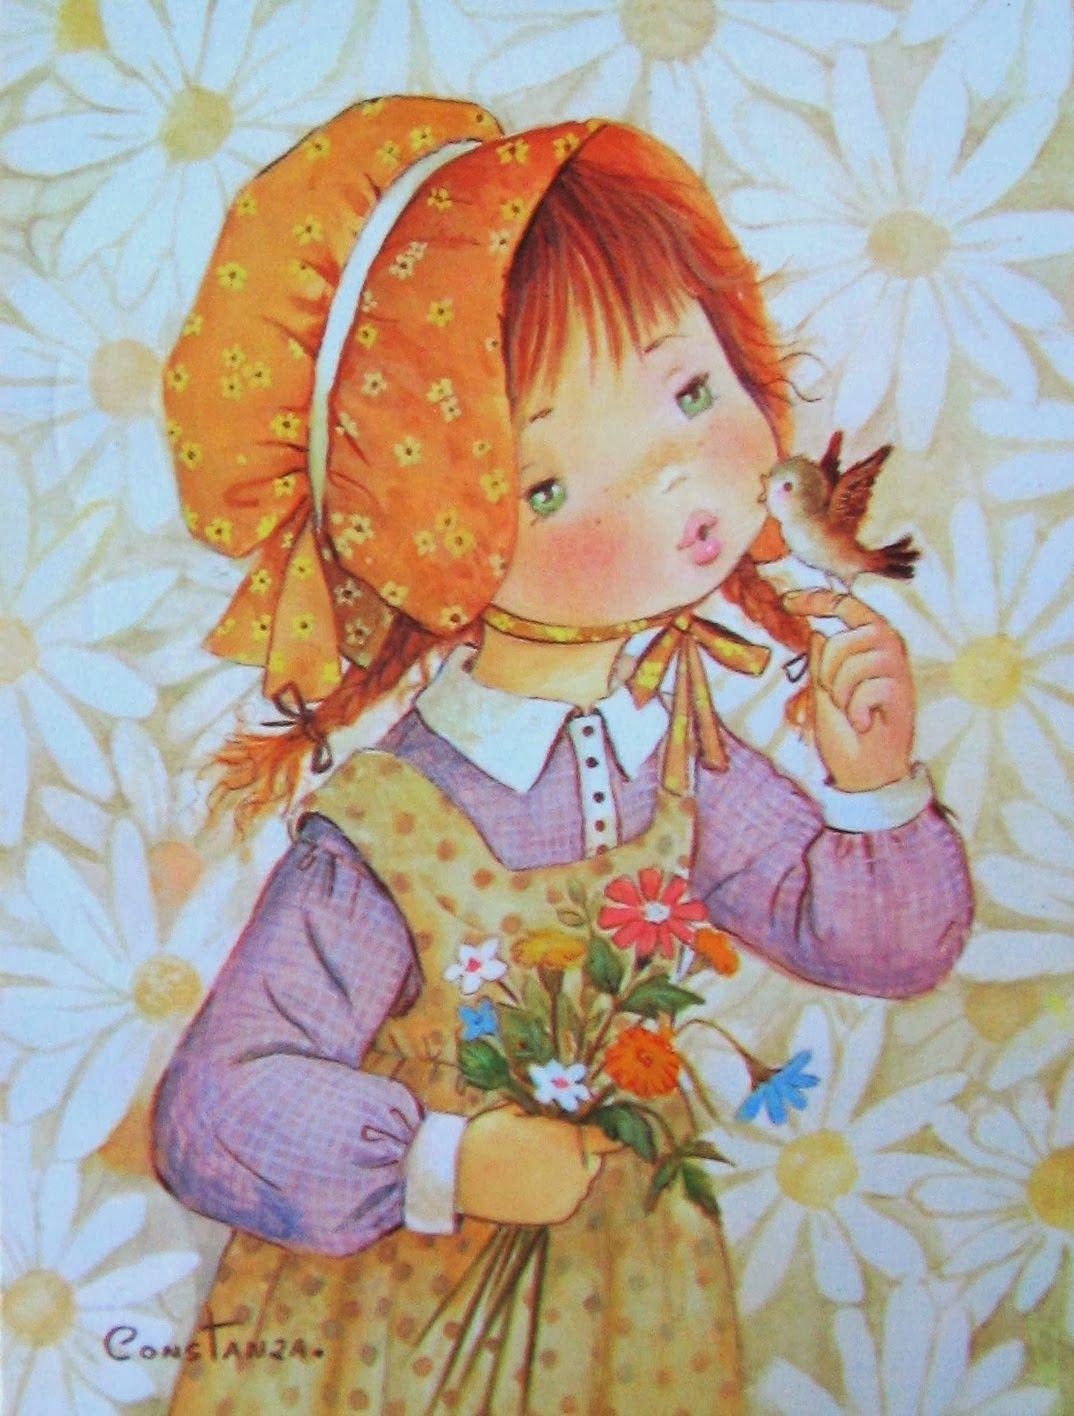 CONSTANZA | Sarah kay, Cute art, Cute pictures